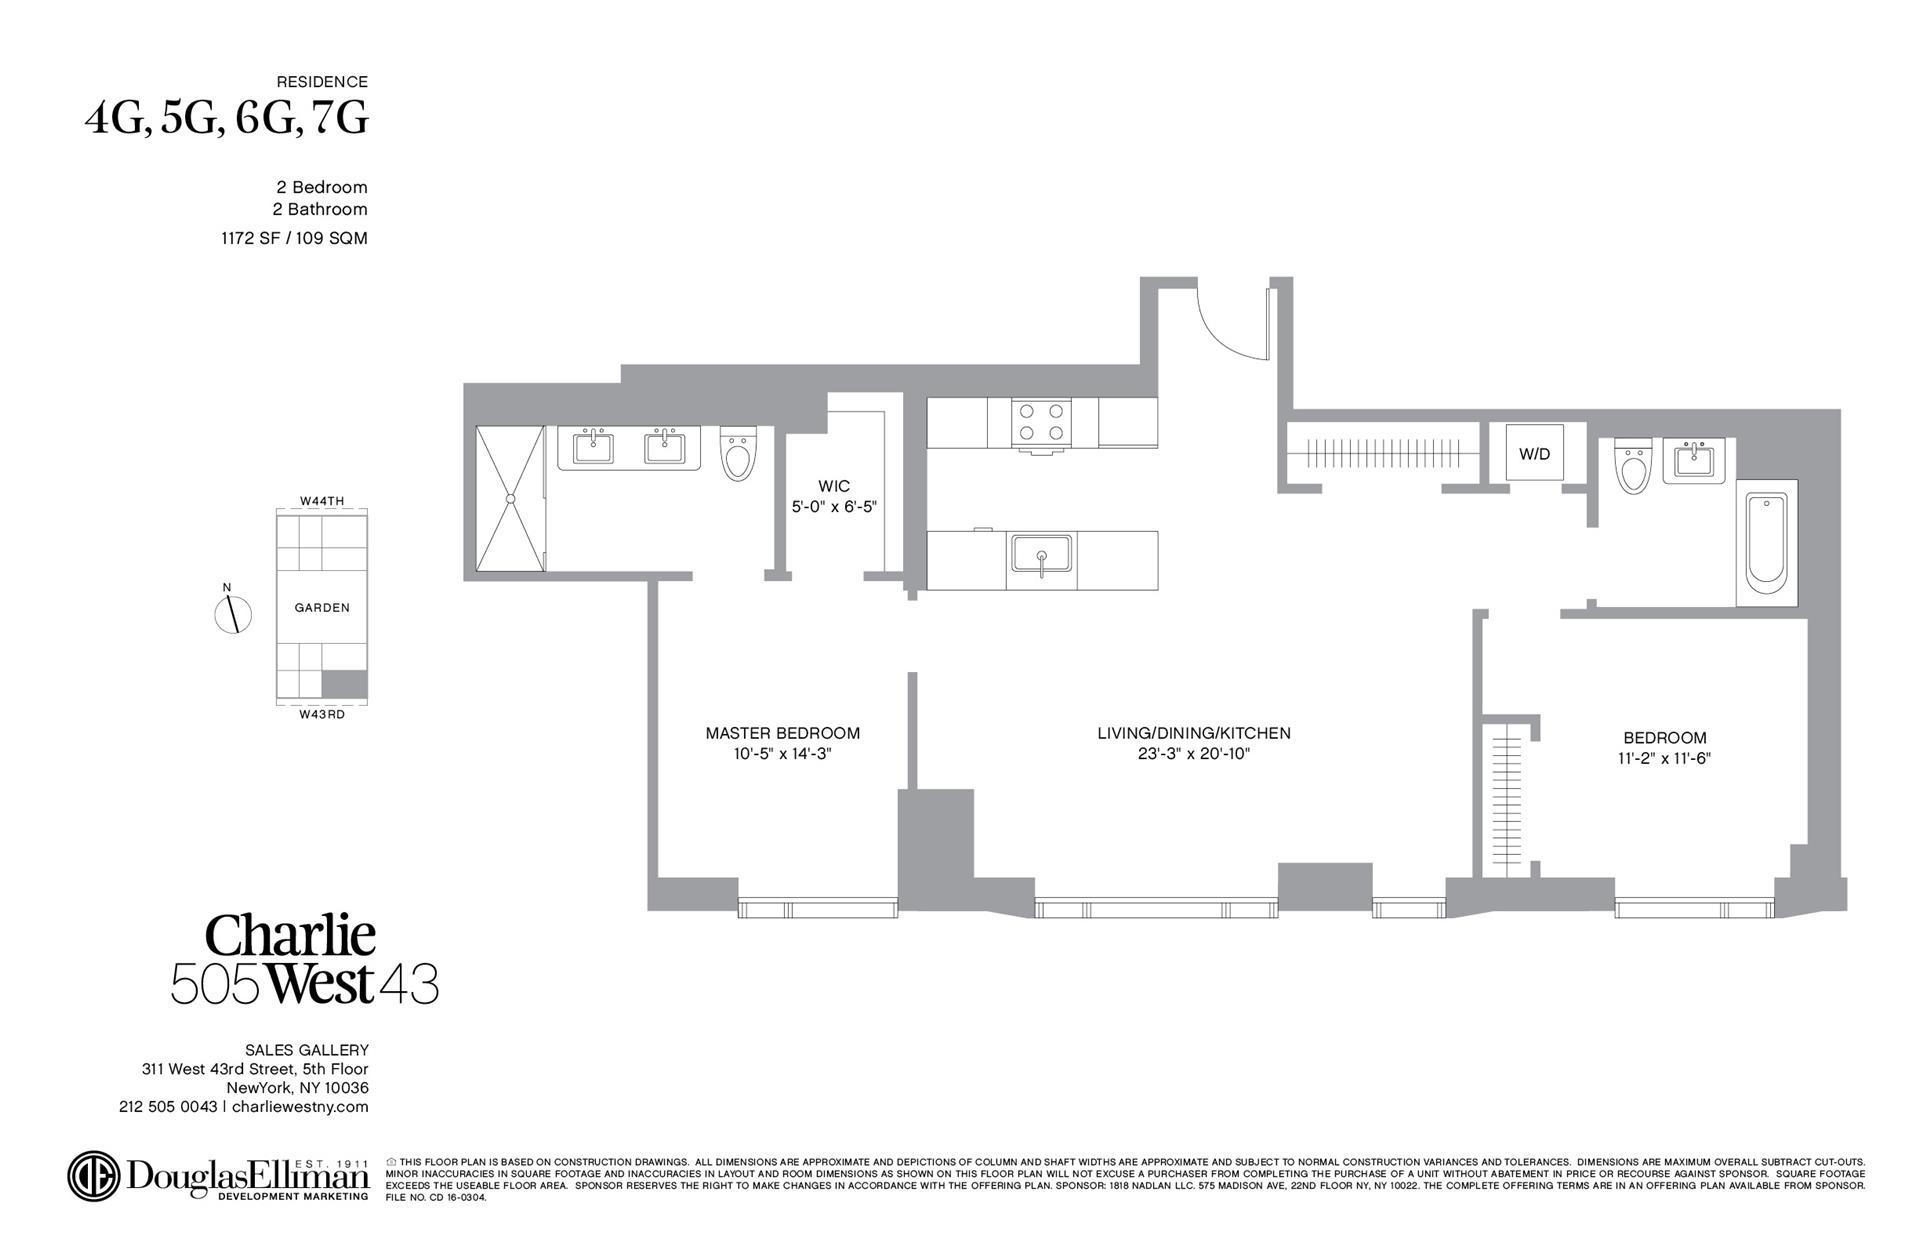 Floor plan of 505 West 43rd St, 5G - Clinton, New York